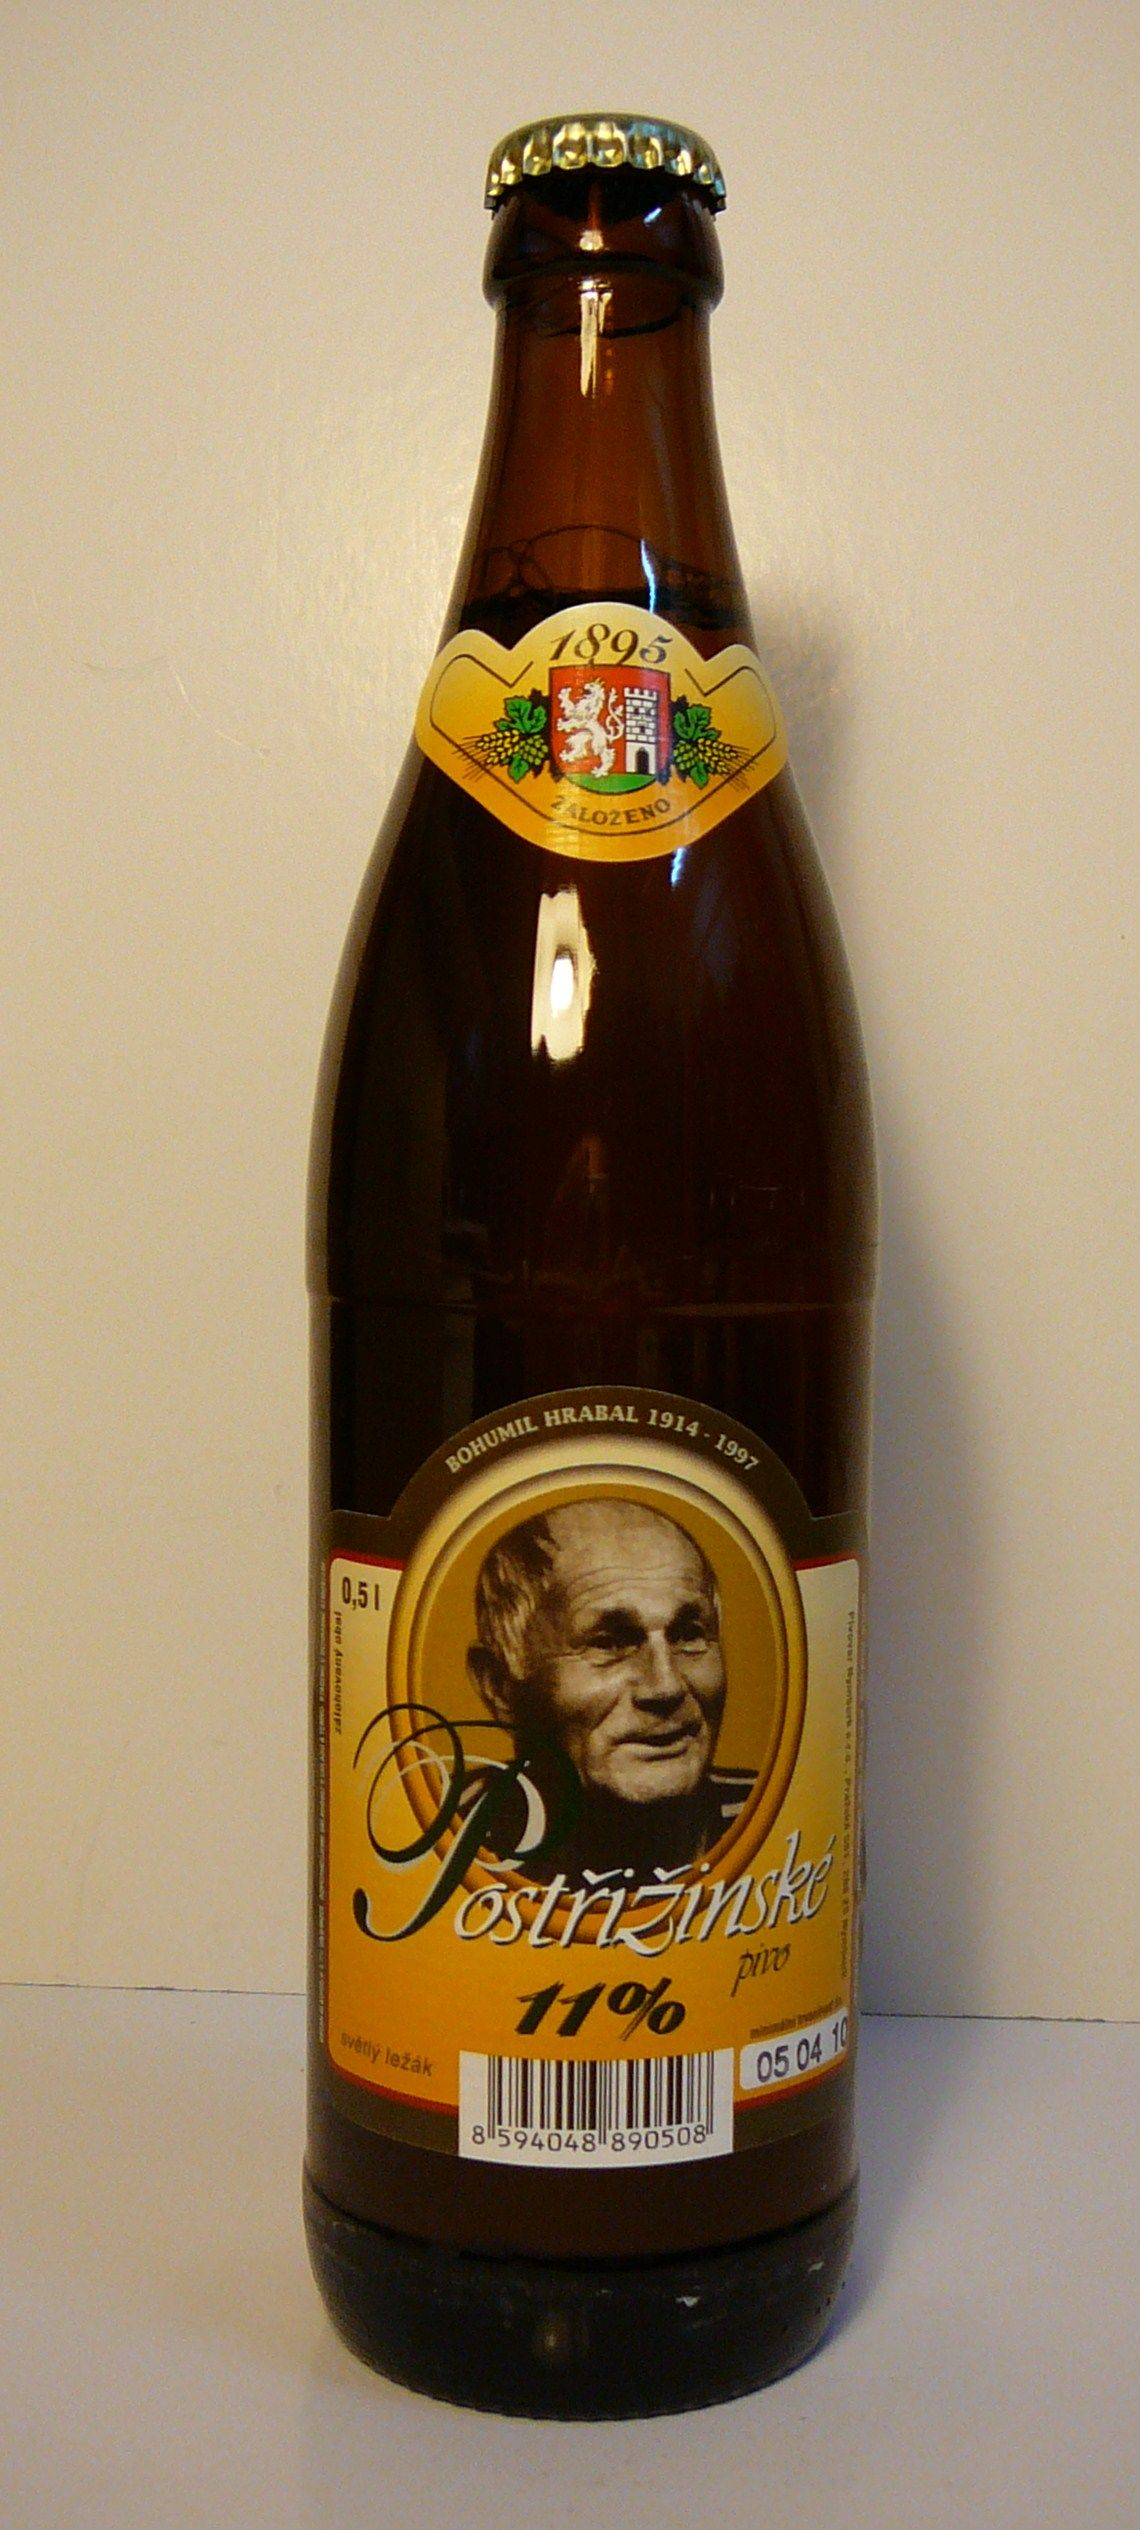 Pivovar Nymburk - Postrizinske Svetly lezak pivo 4,7% pullo